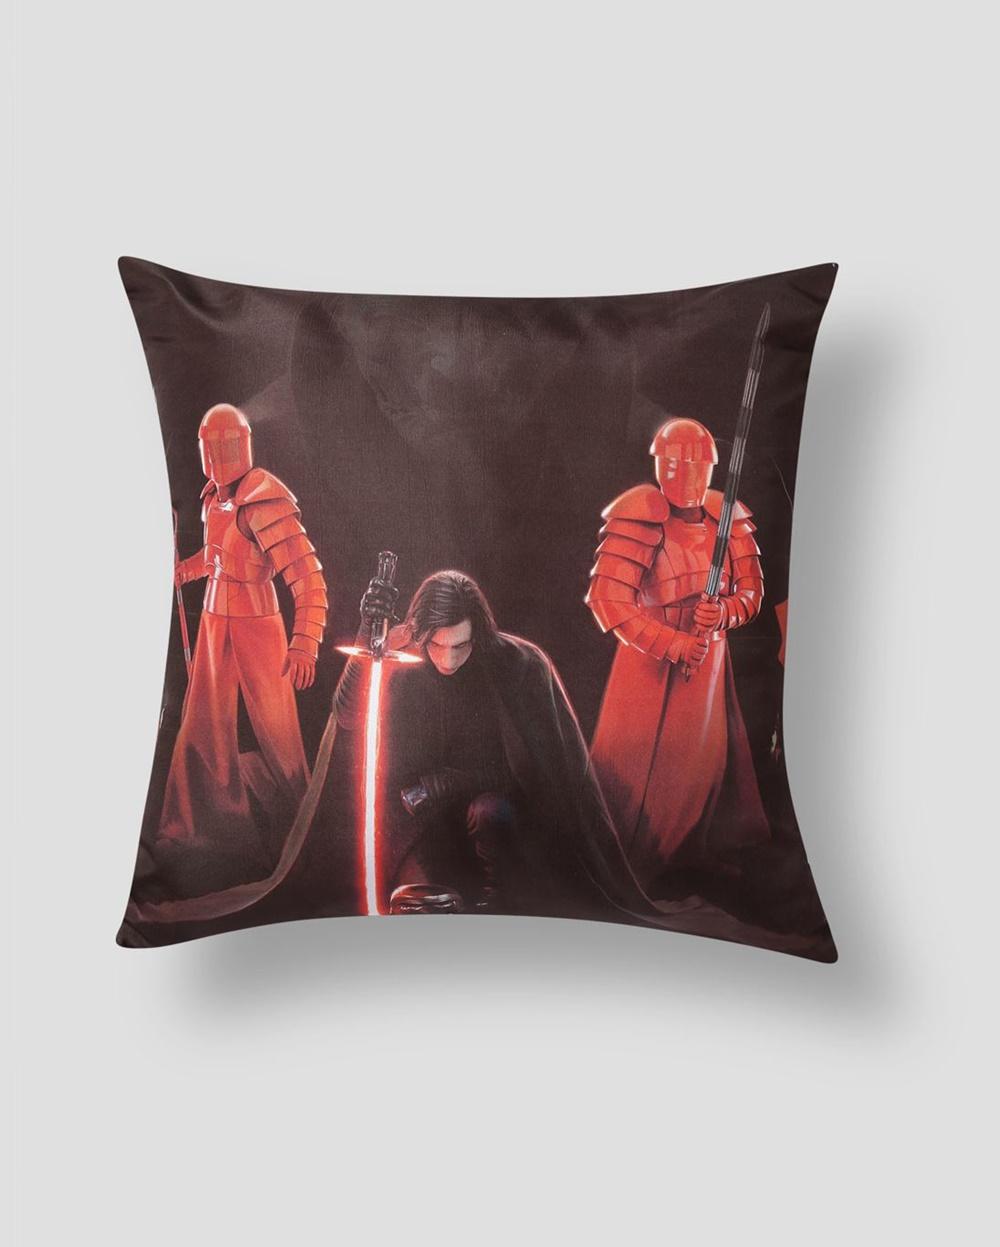 Almofada Star Wars 43cm x 43cm Kilo R$ 49,90